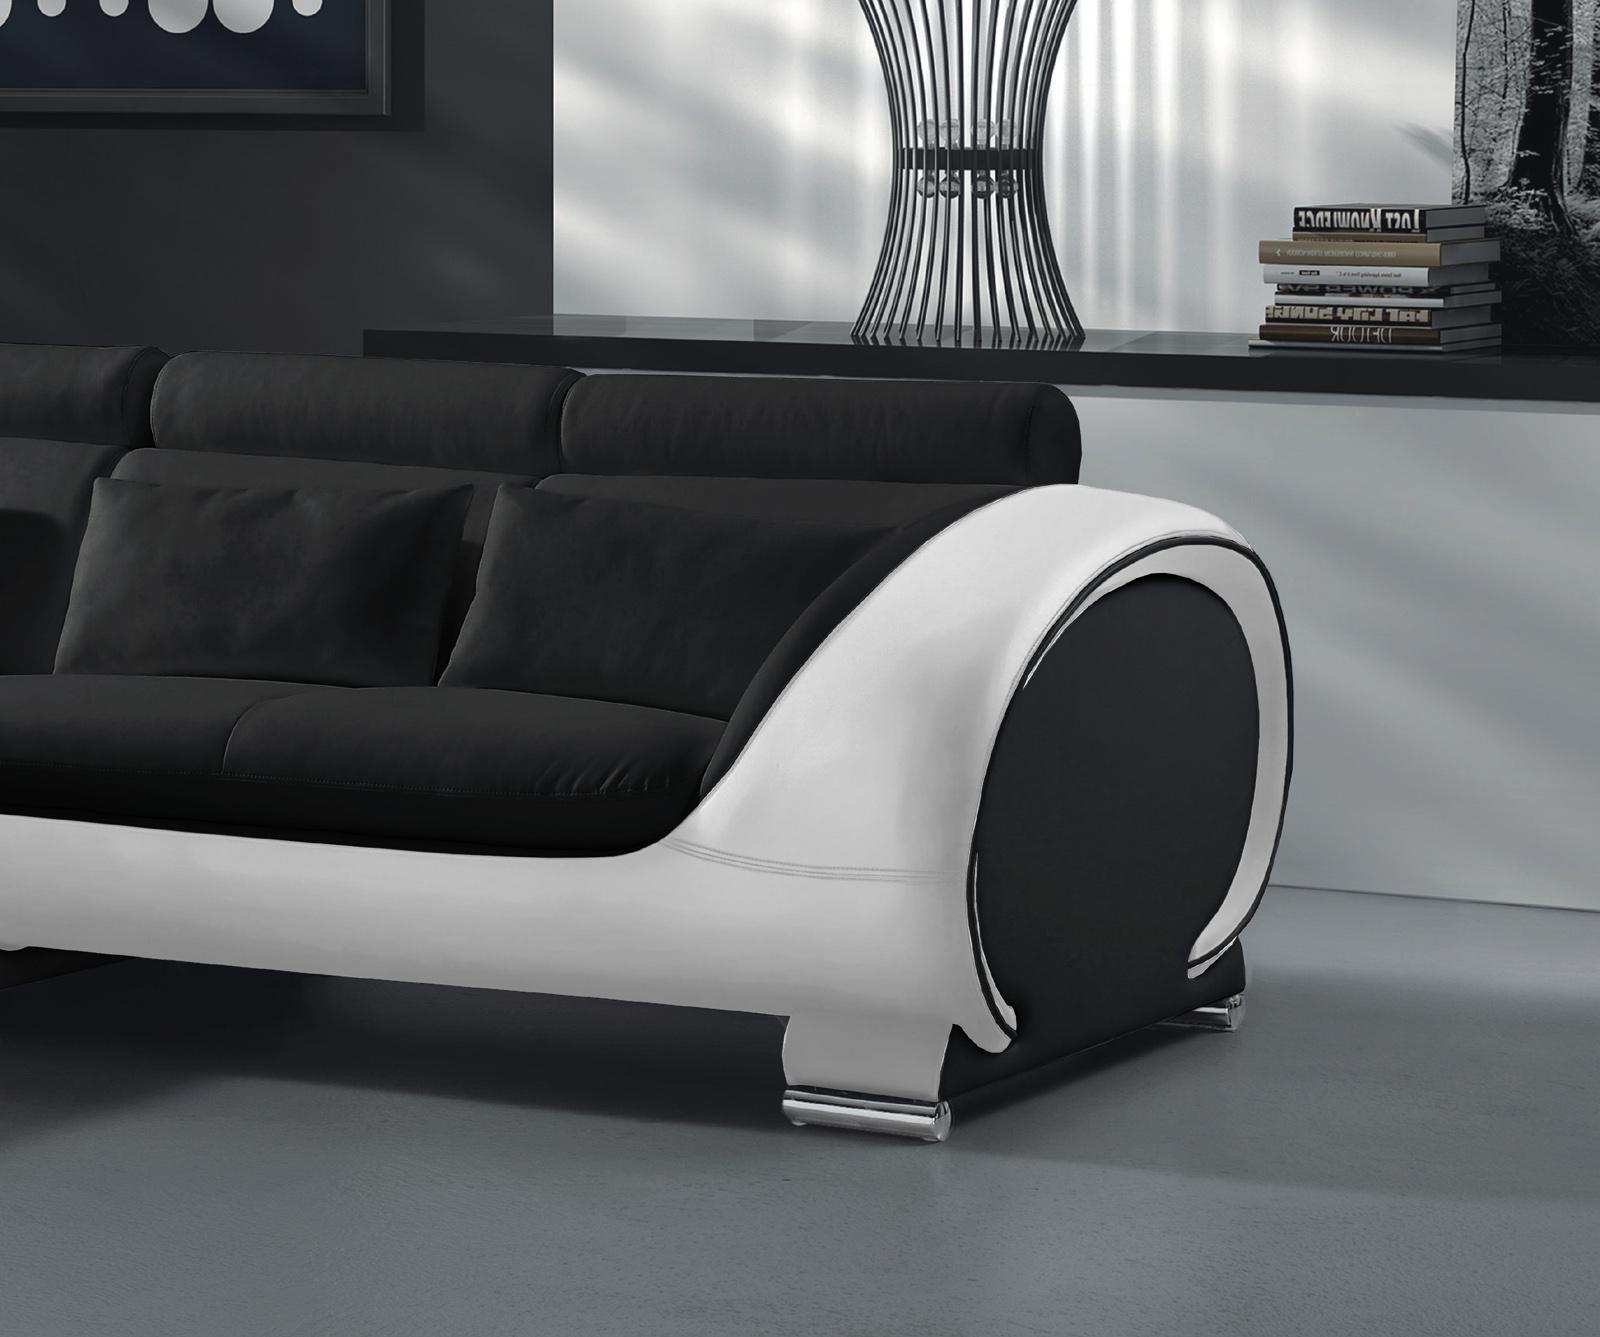 sam sofa schwarz wei vigo combi 1 couch 181 x 242 cm auf lager. Black Bedroom Furniture Sets. Home Design Ideas